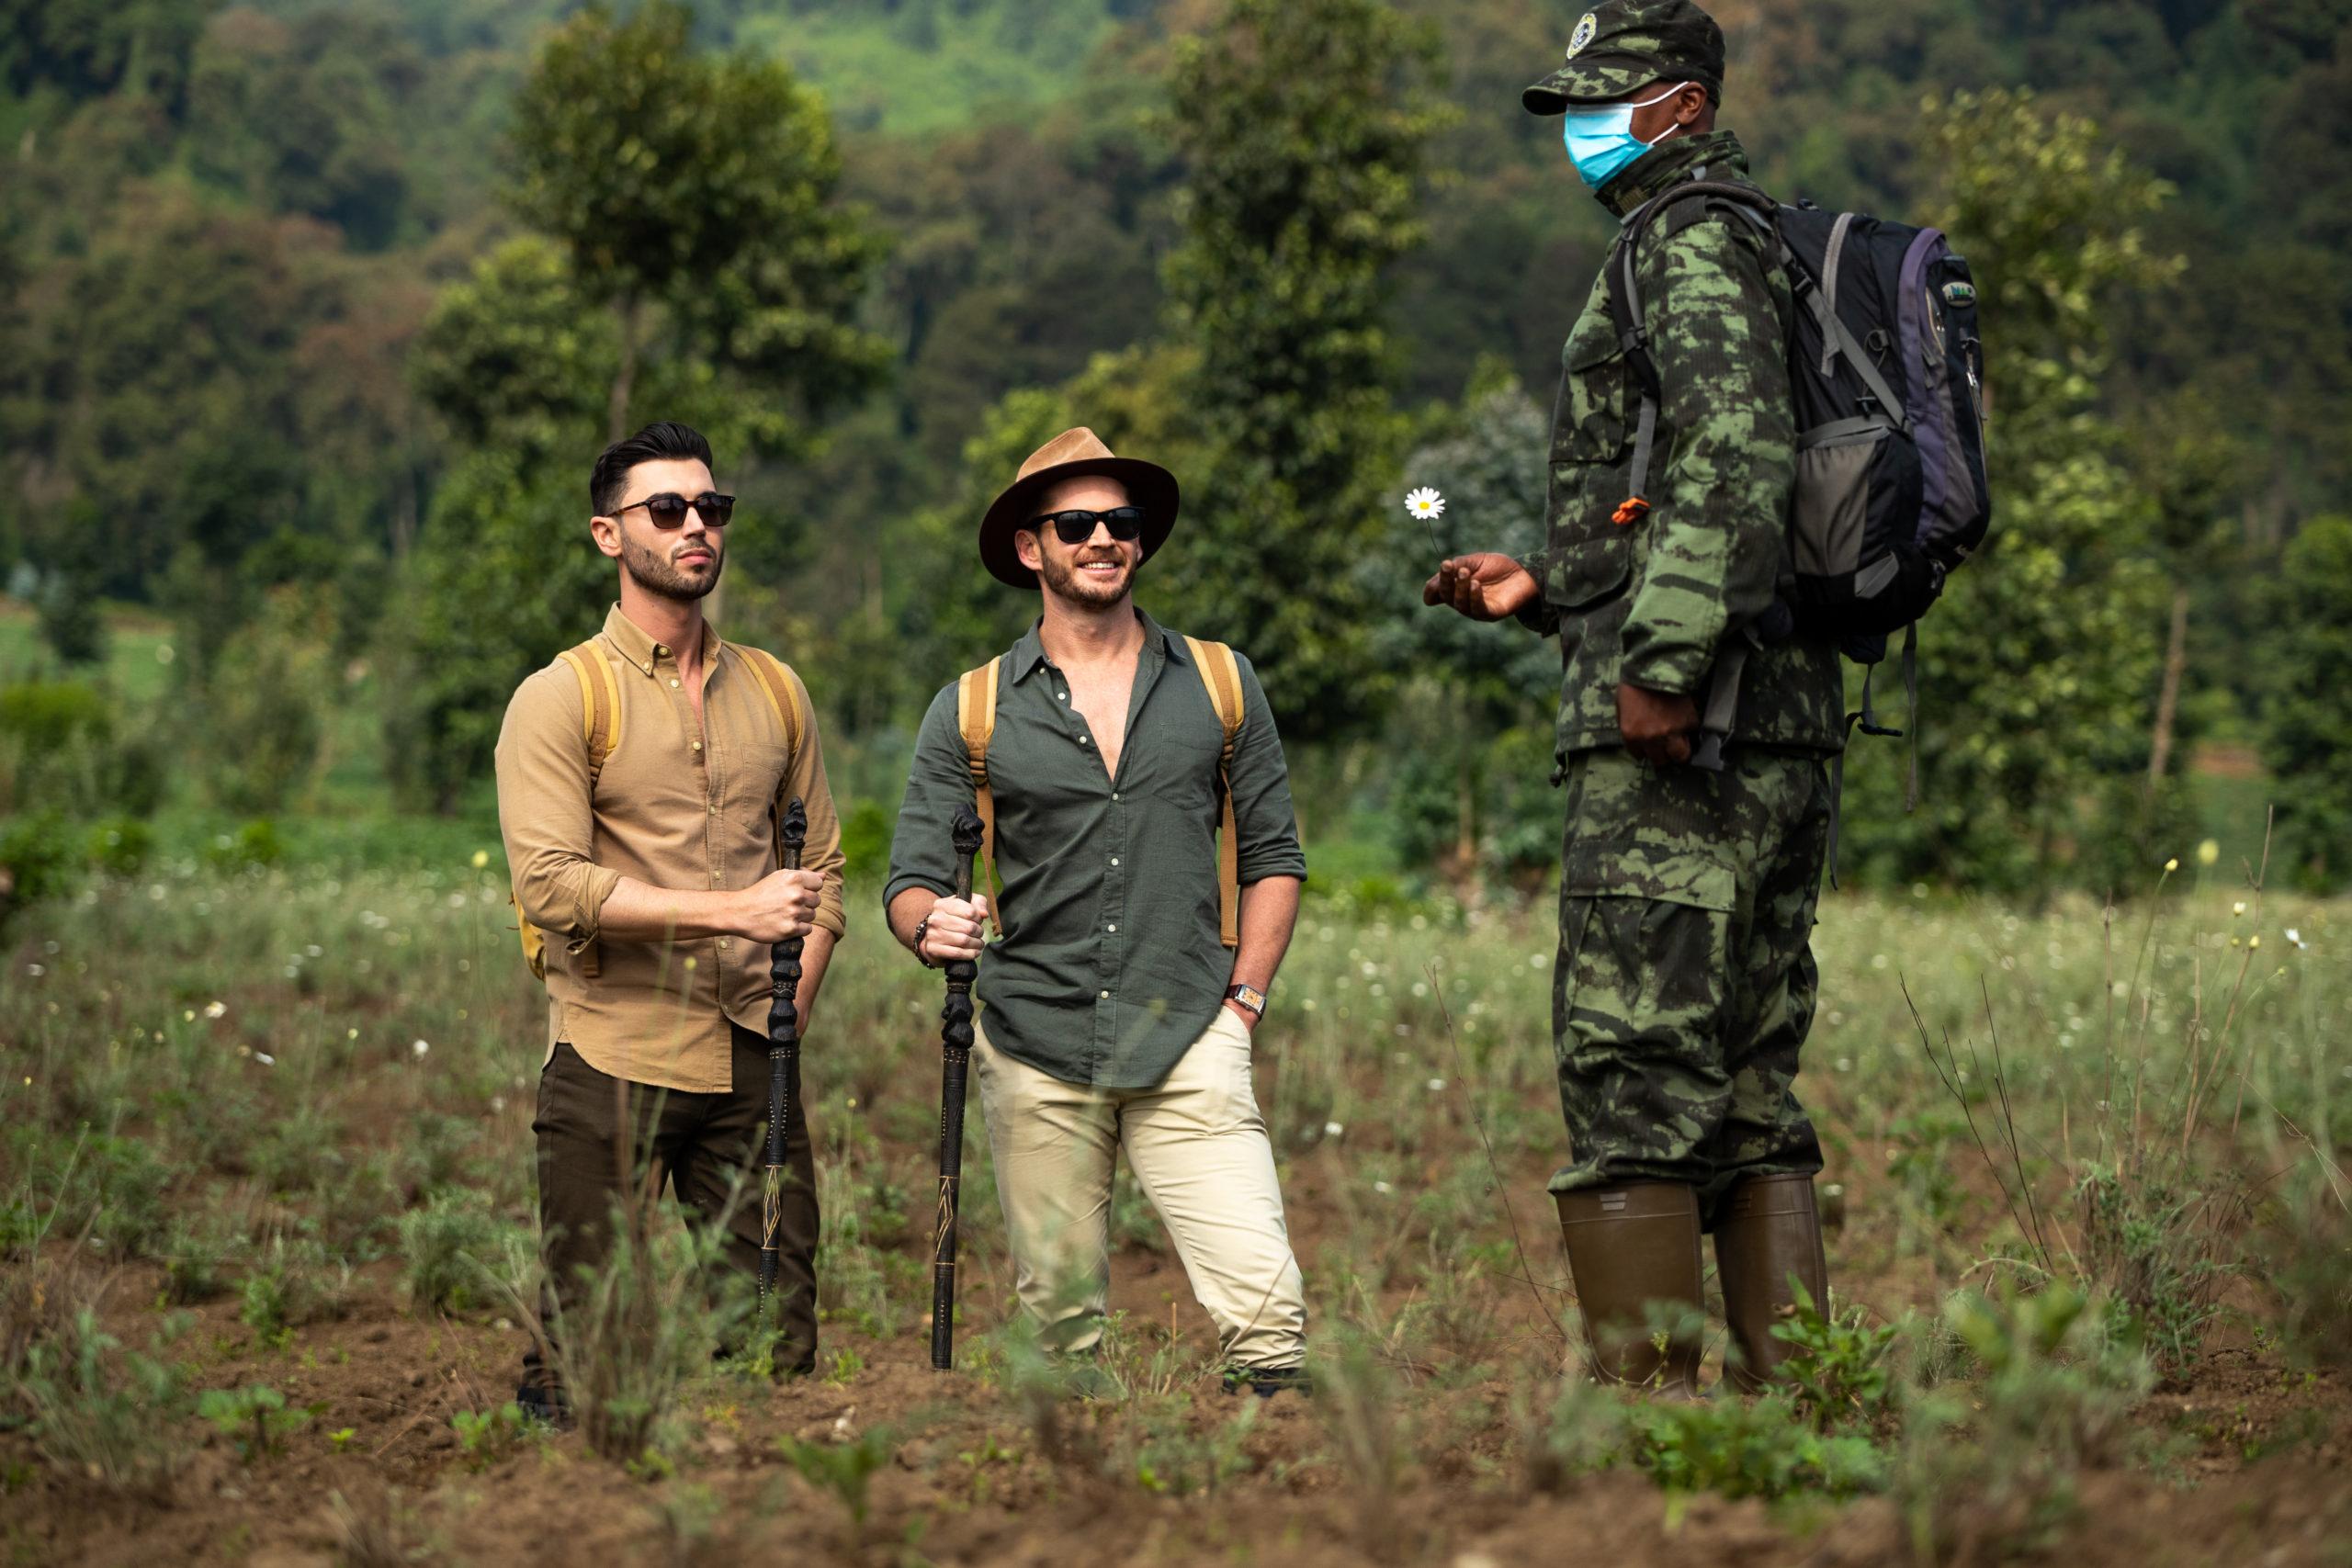 Gorilla Trekking in Rwanda guides